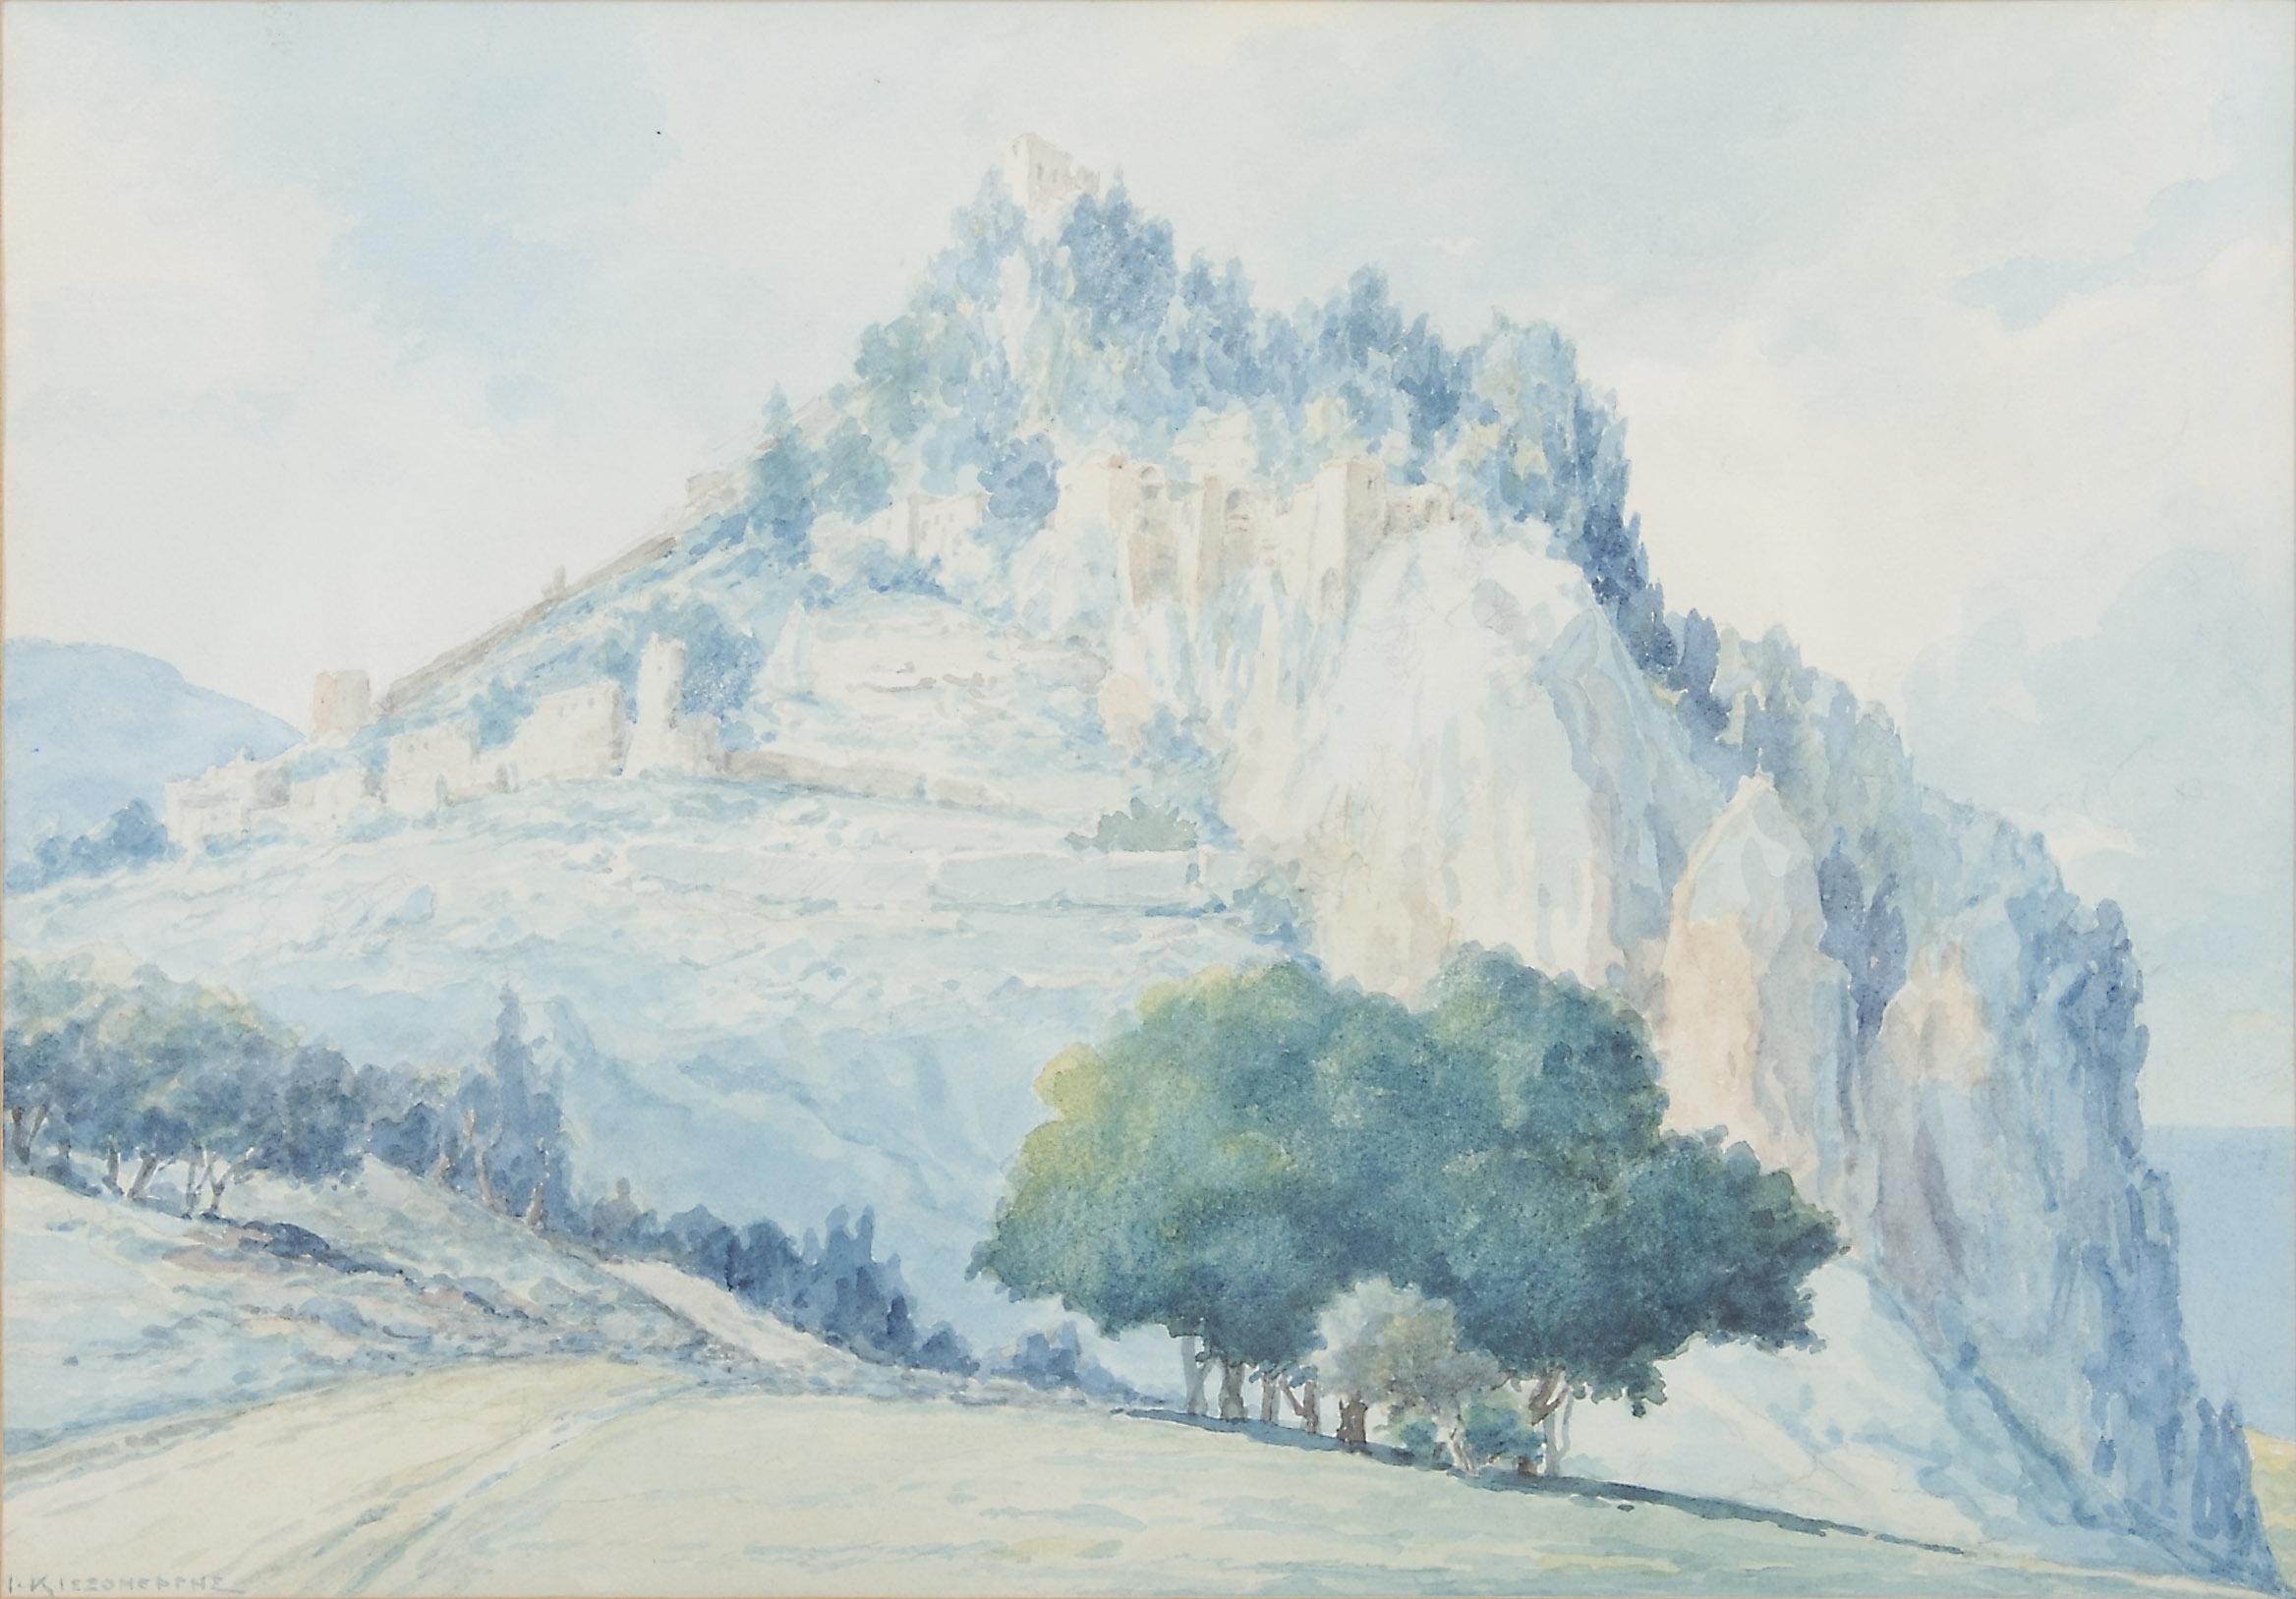 Ioannis Kissonerghis, St Helarion, Watercolour, A G Leventis Gallery, Nicosia